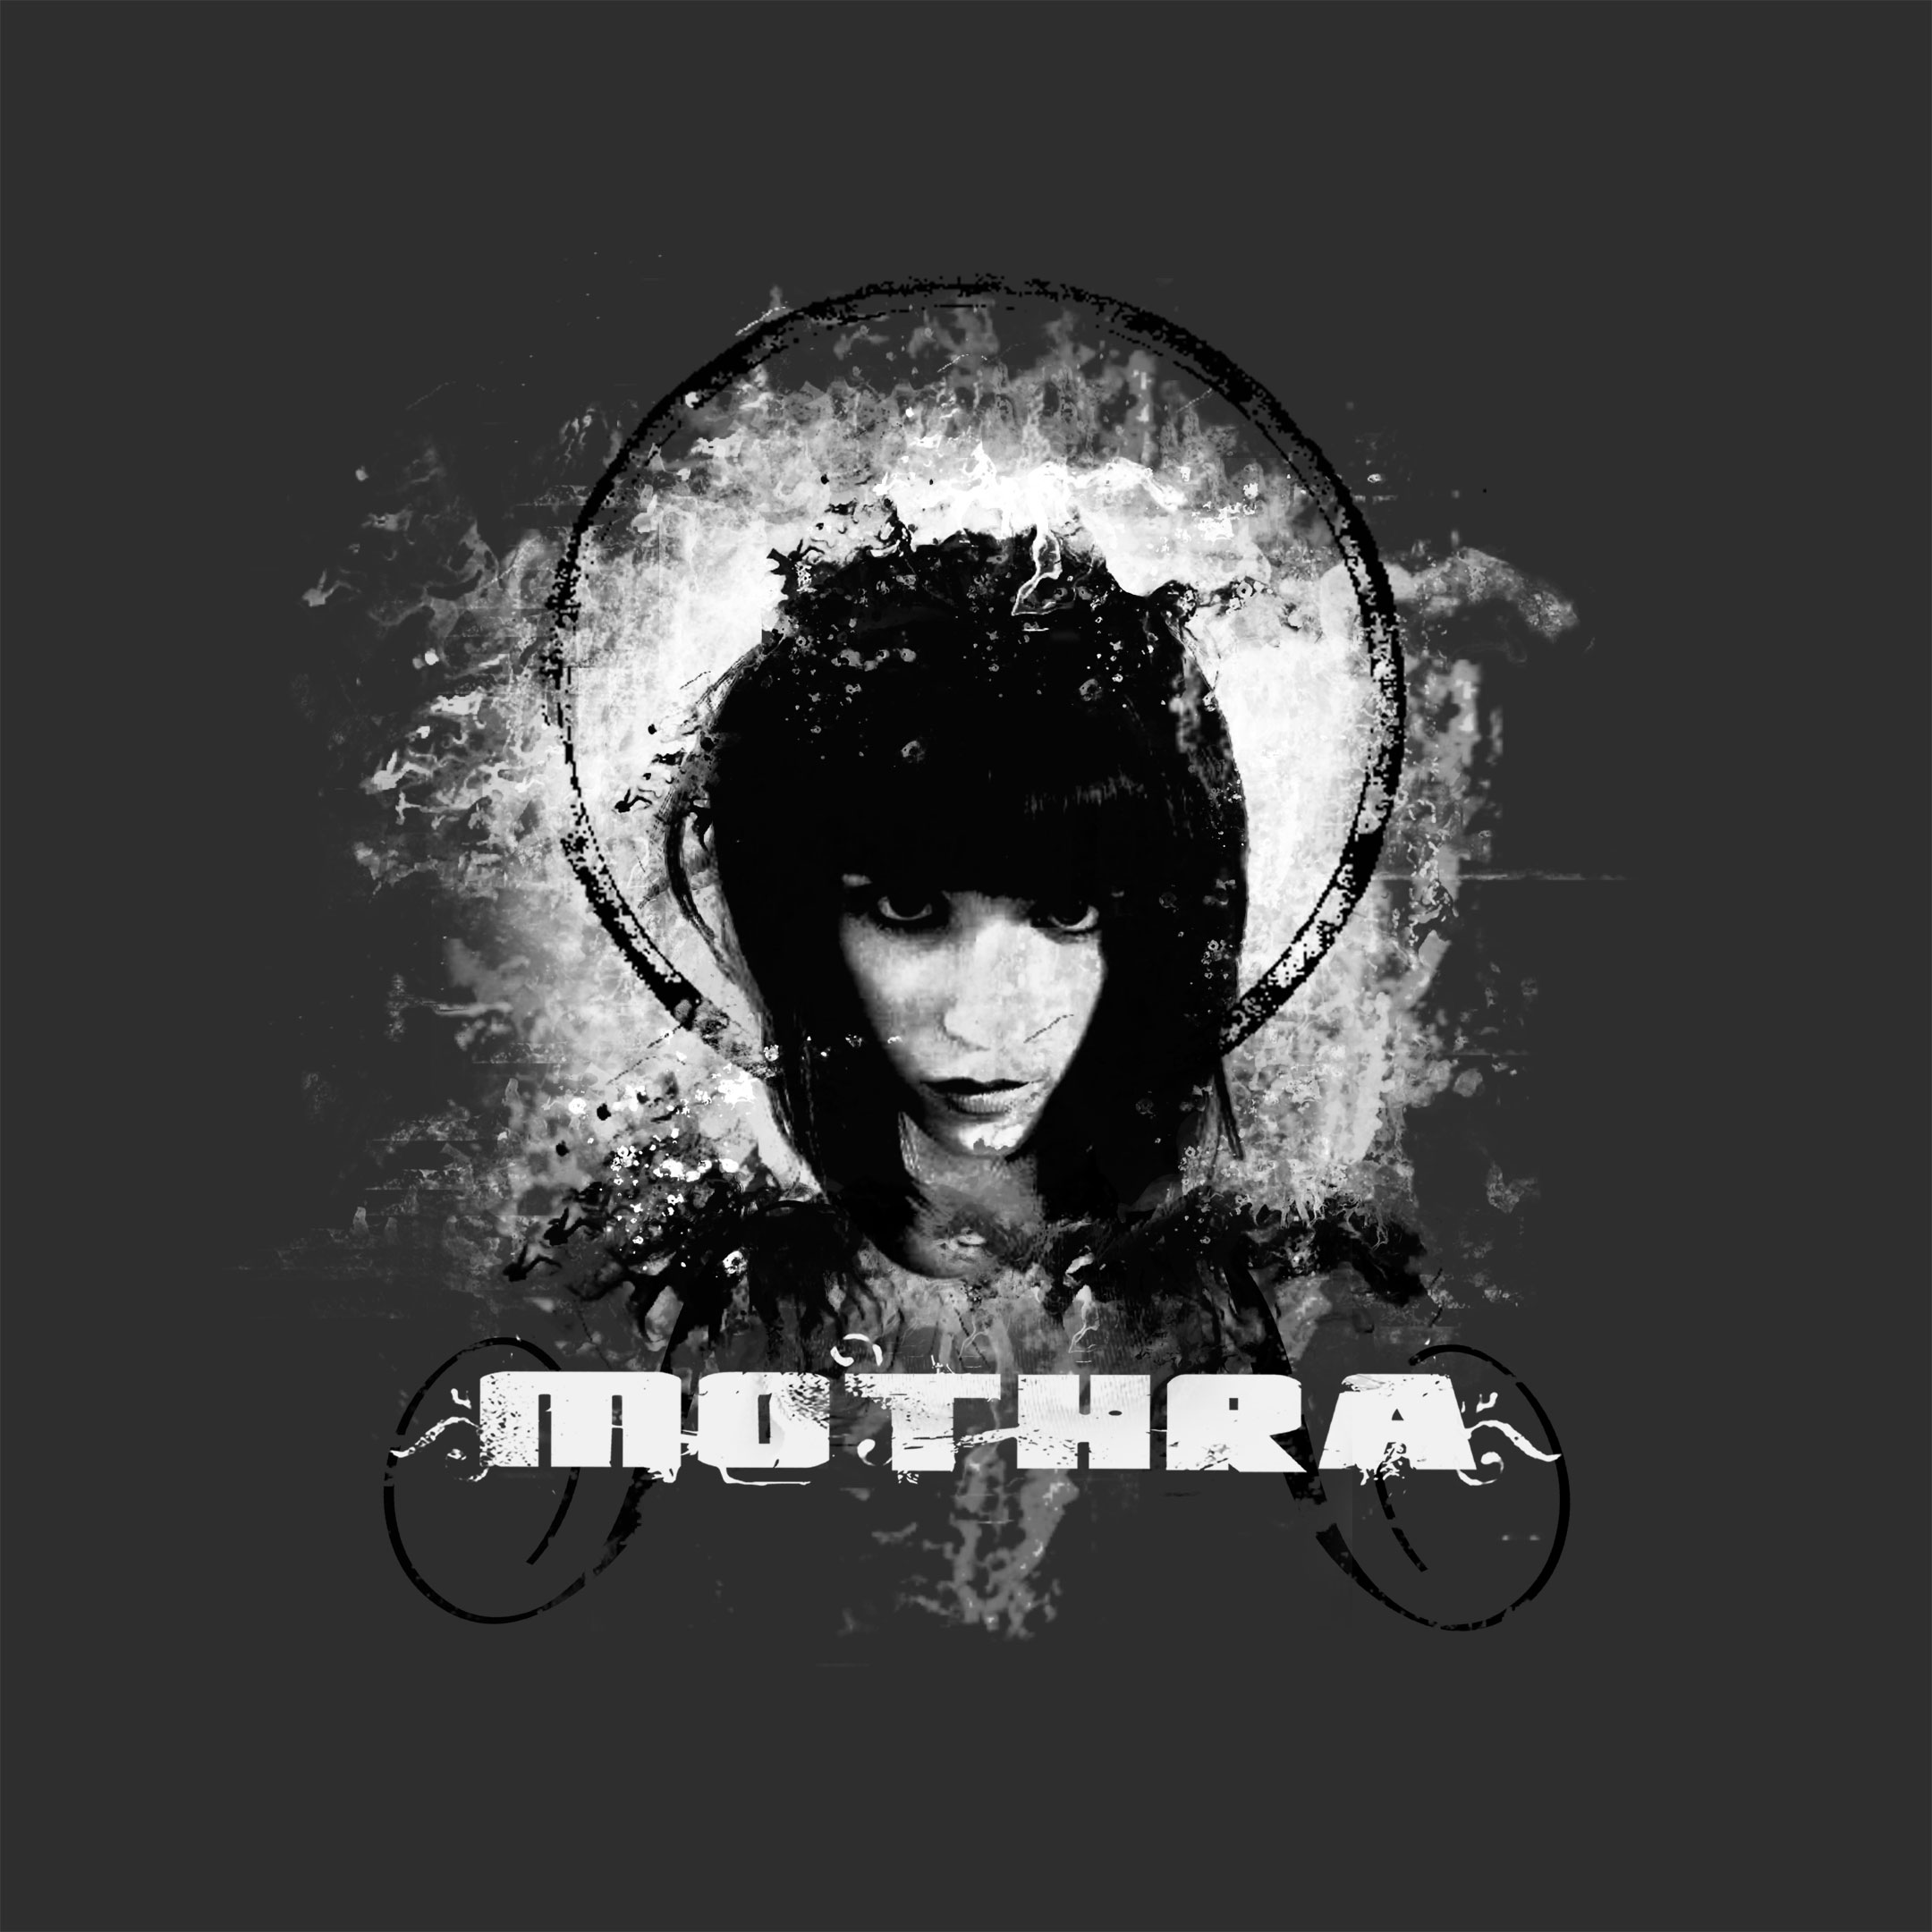 mothra shirt